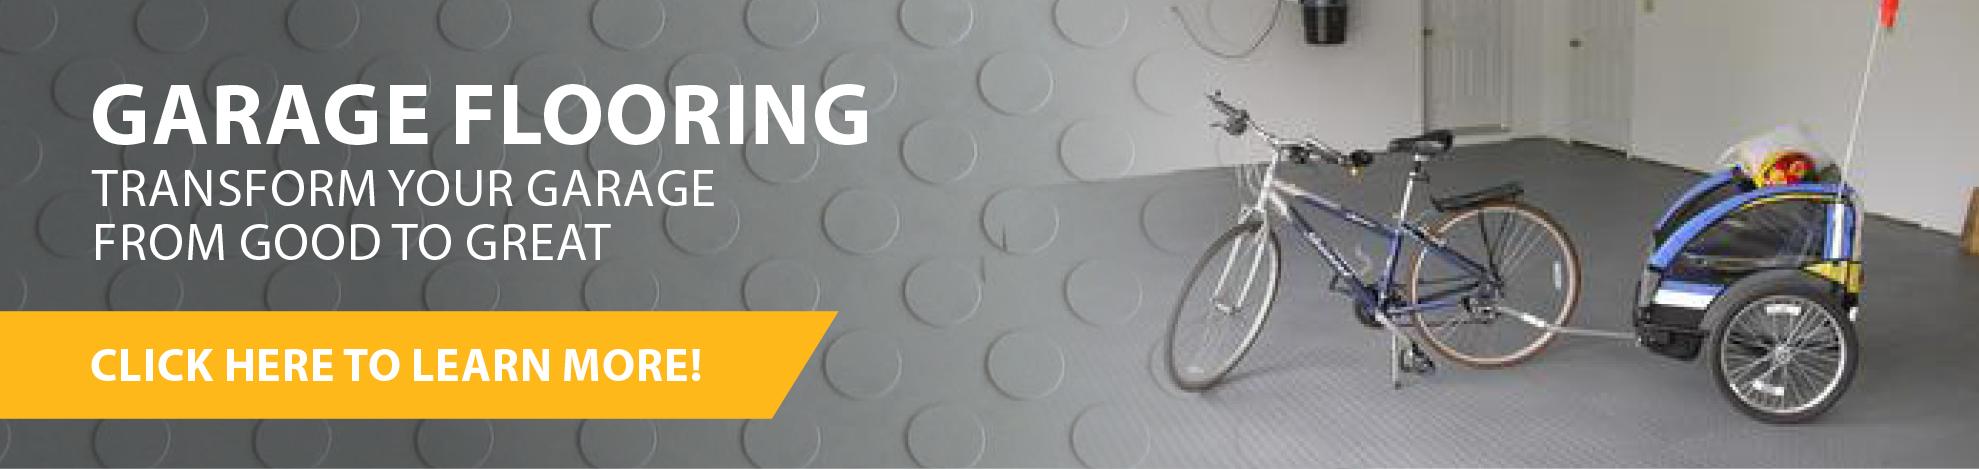 Rymar-Rubber-Web-Banners-Garage-Flooring2.jpg